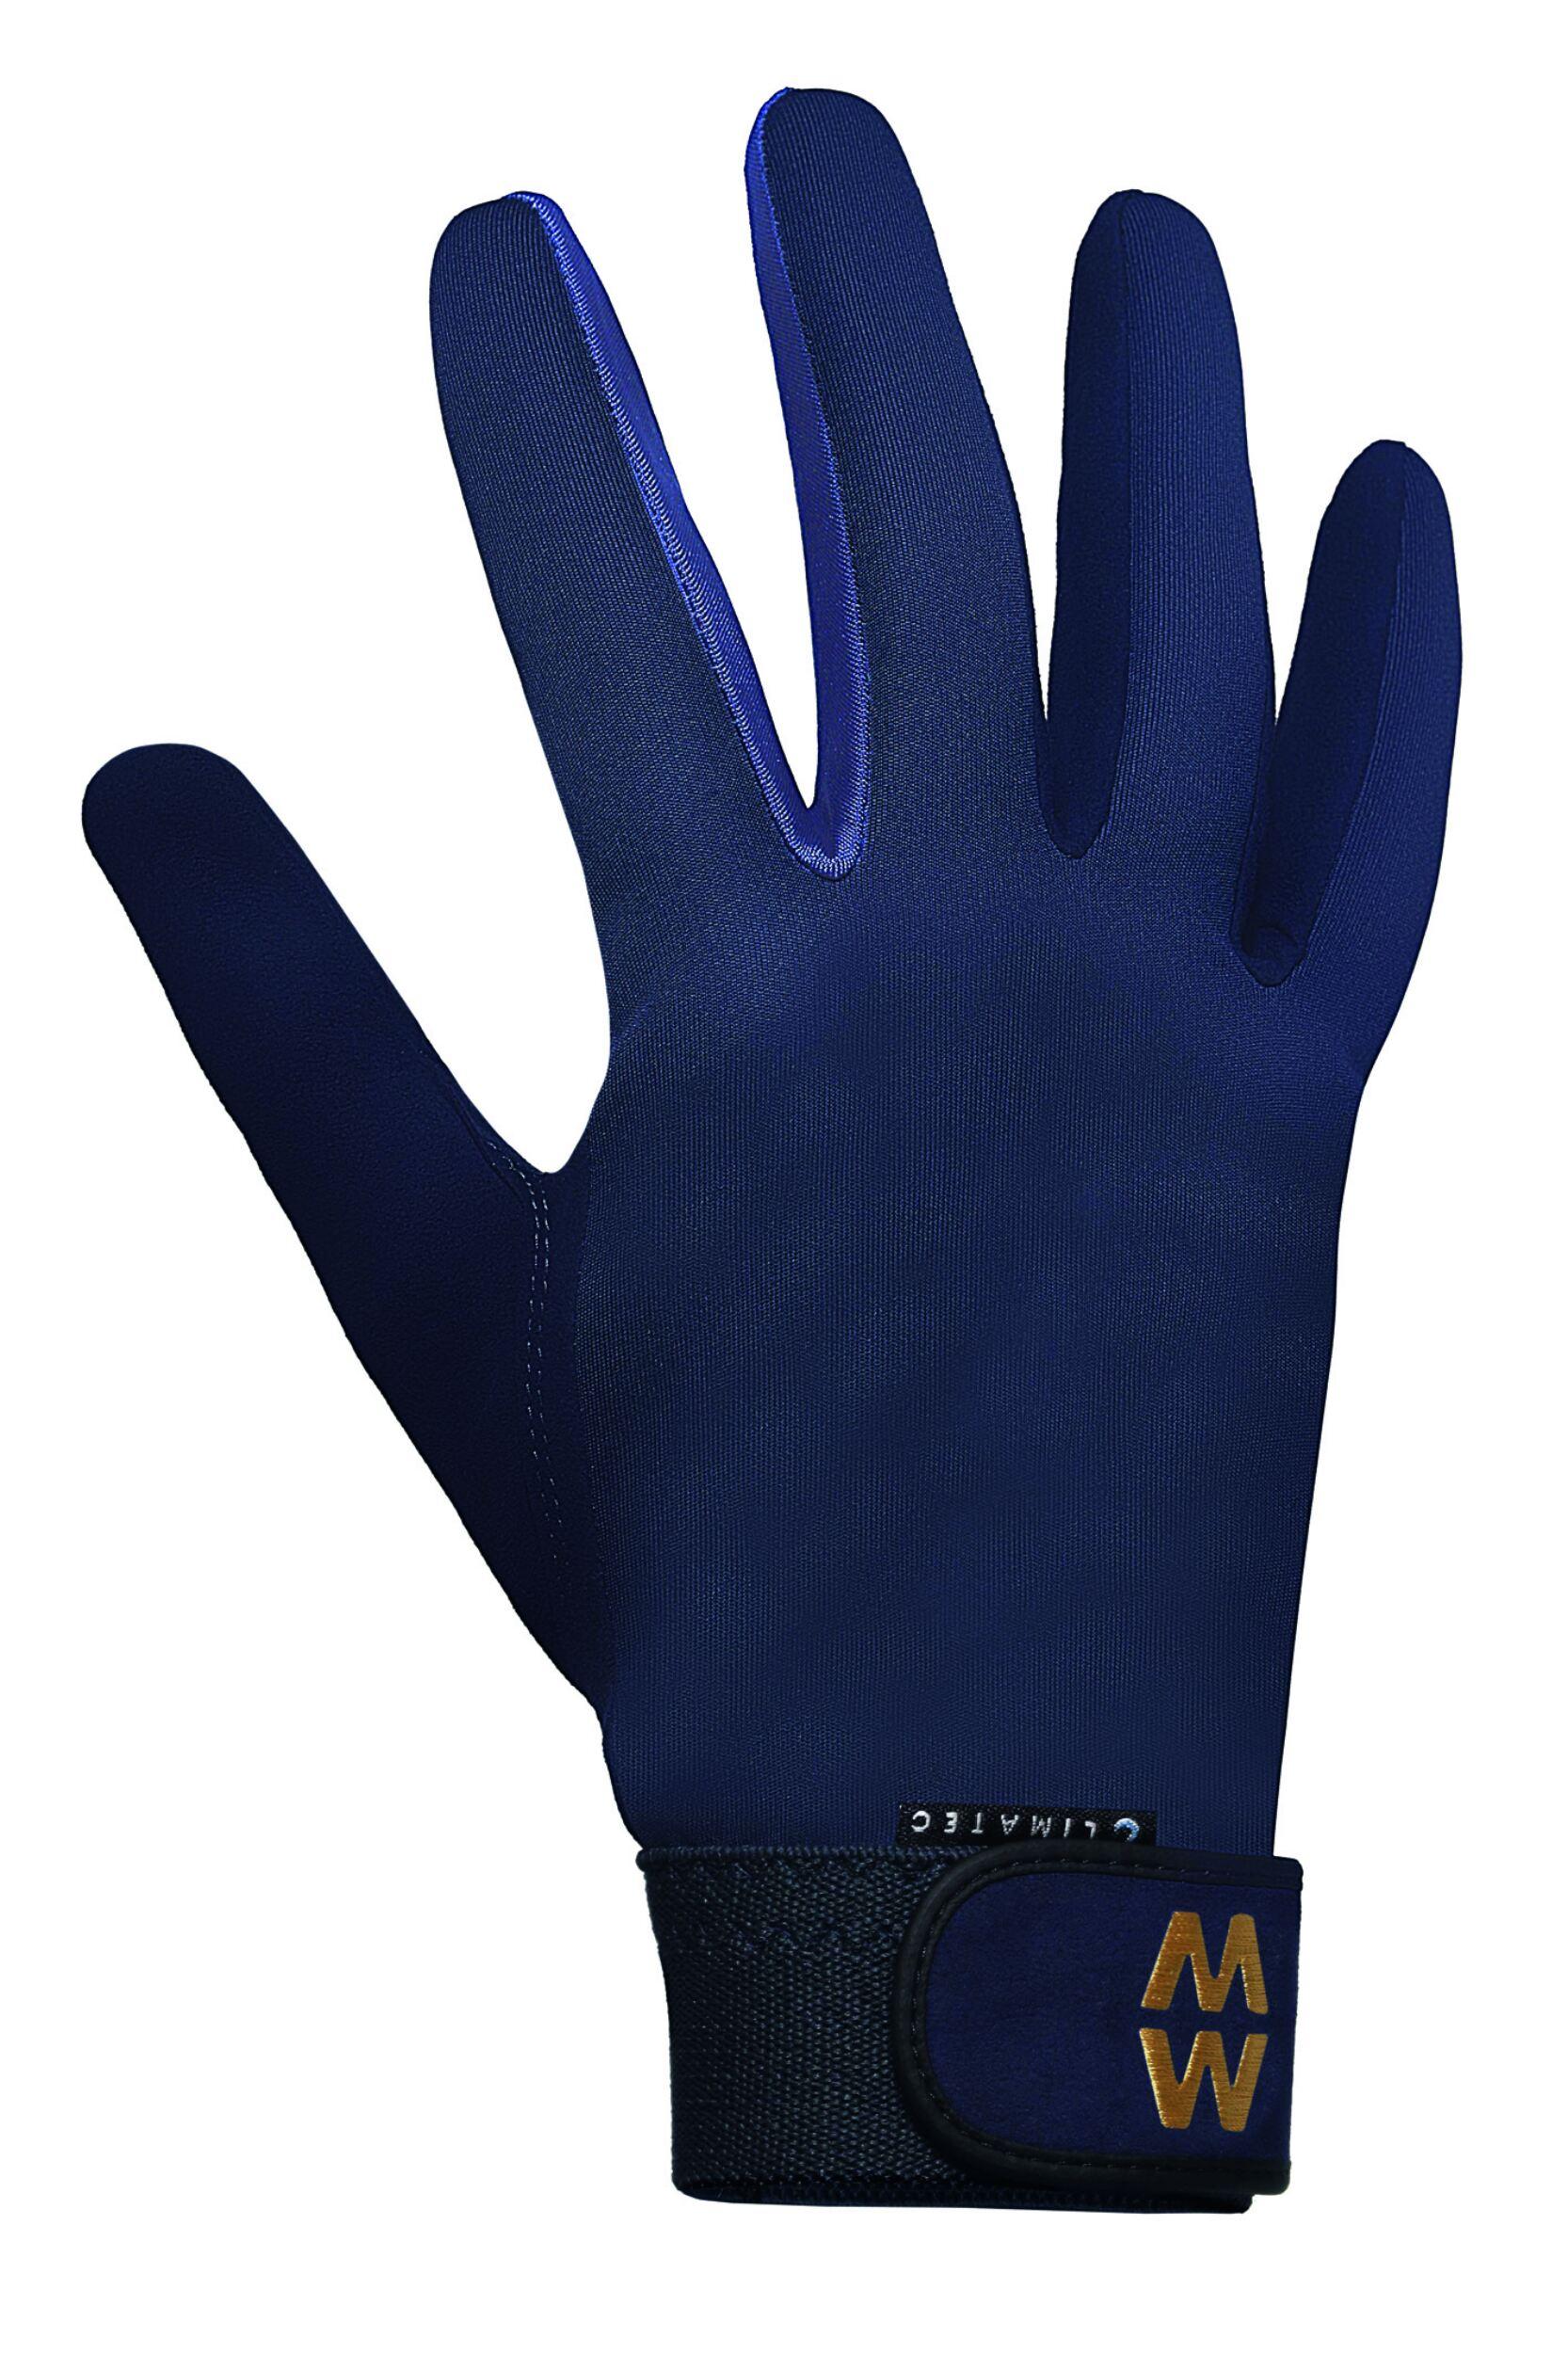 Mens-amp-Ladies-1-Pair-MacWet-Long-Climatec-Sports-Gloves thumbnail 2